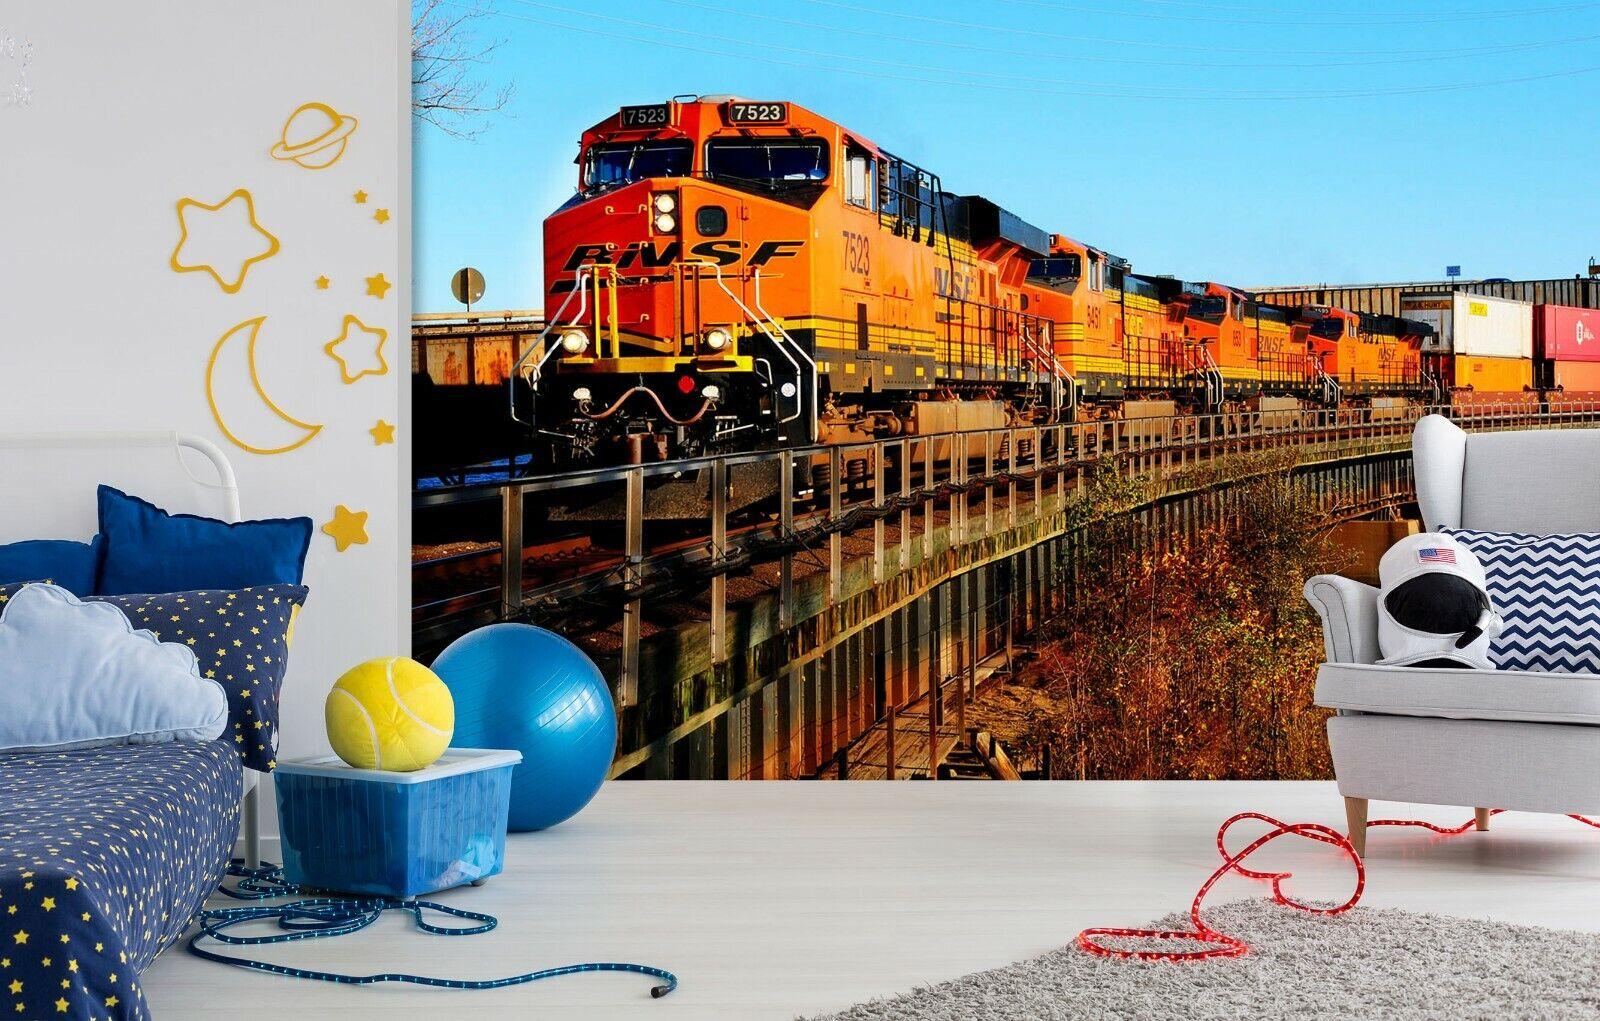 3D Blau Sky Train I41 Transport Wallpaper Mural Sefl-adhesive Removable Angelia